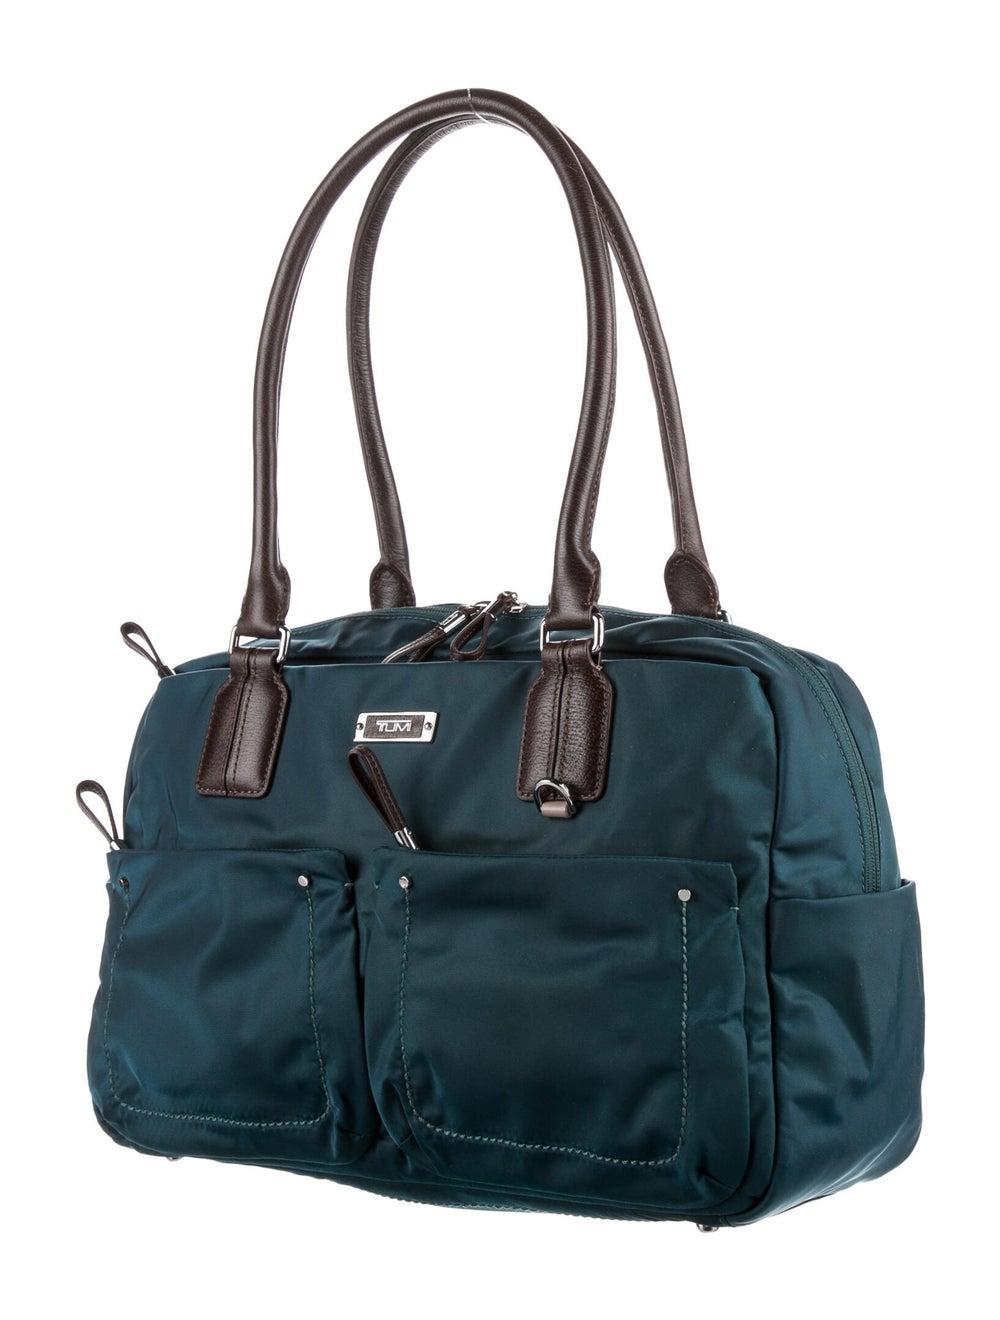 Tumi Nylon Shoulder Bag Blue - image 3